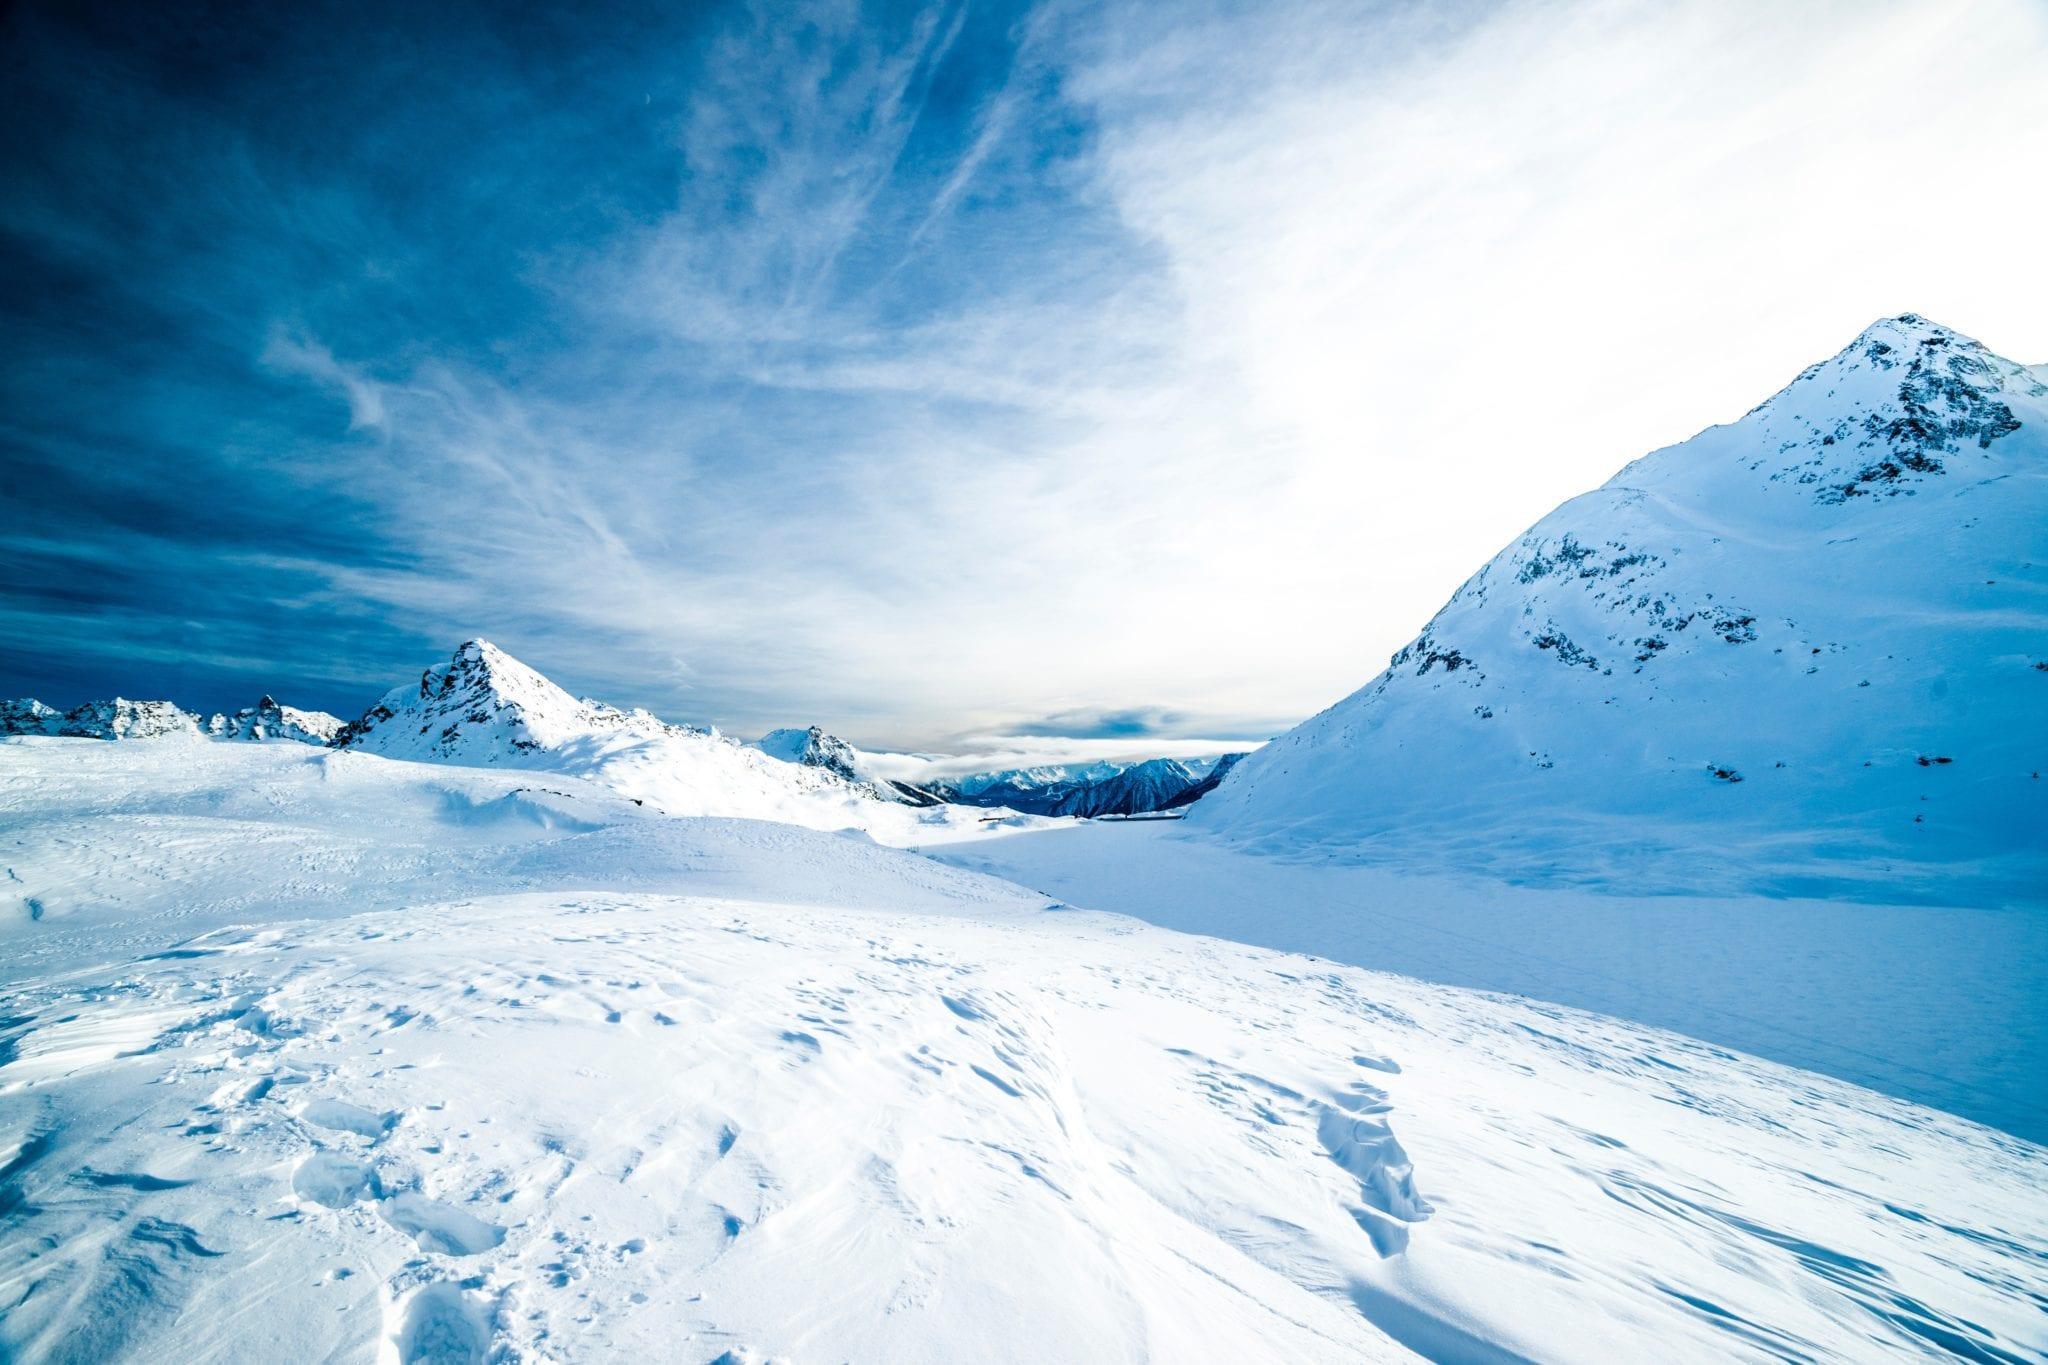 stations de ski nice cote d azur stations alpes maritime cannes tendances stations de ski nice neige nice